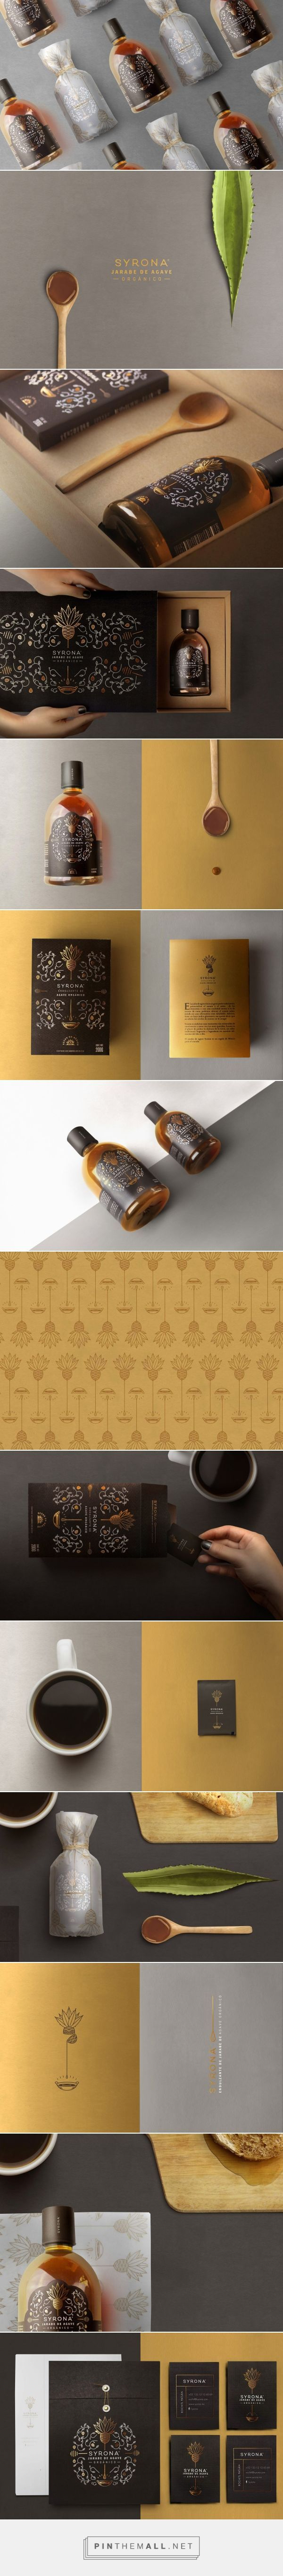 Syrona Packaging by TORO PINTO   Fivestar Branding – Design and Branding Agency…